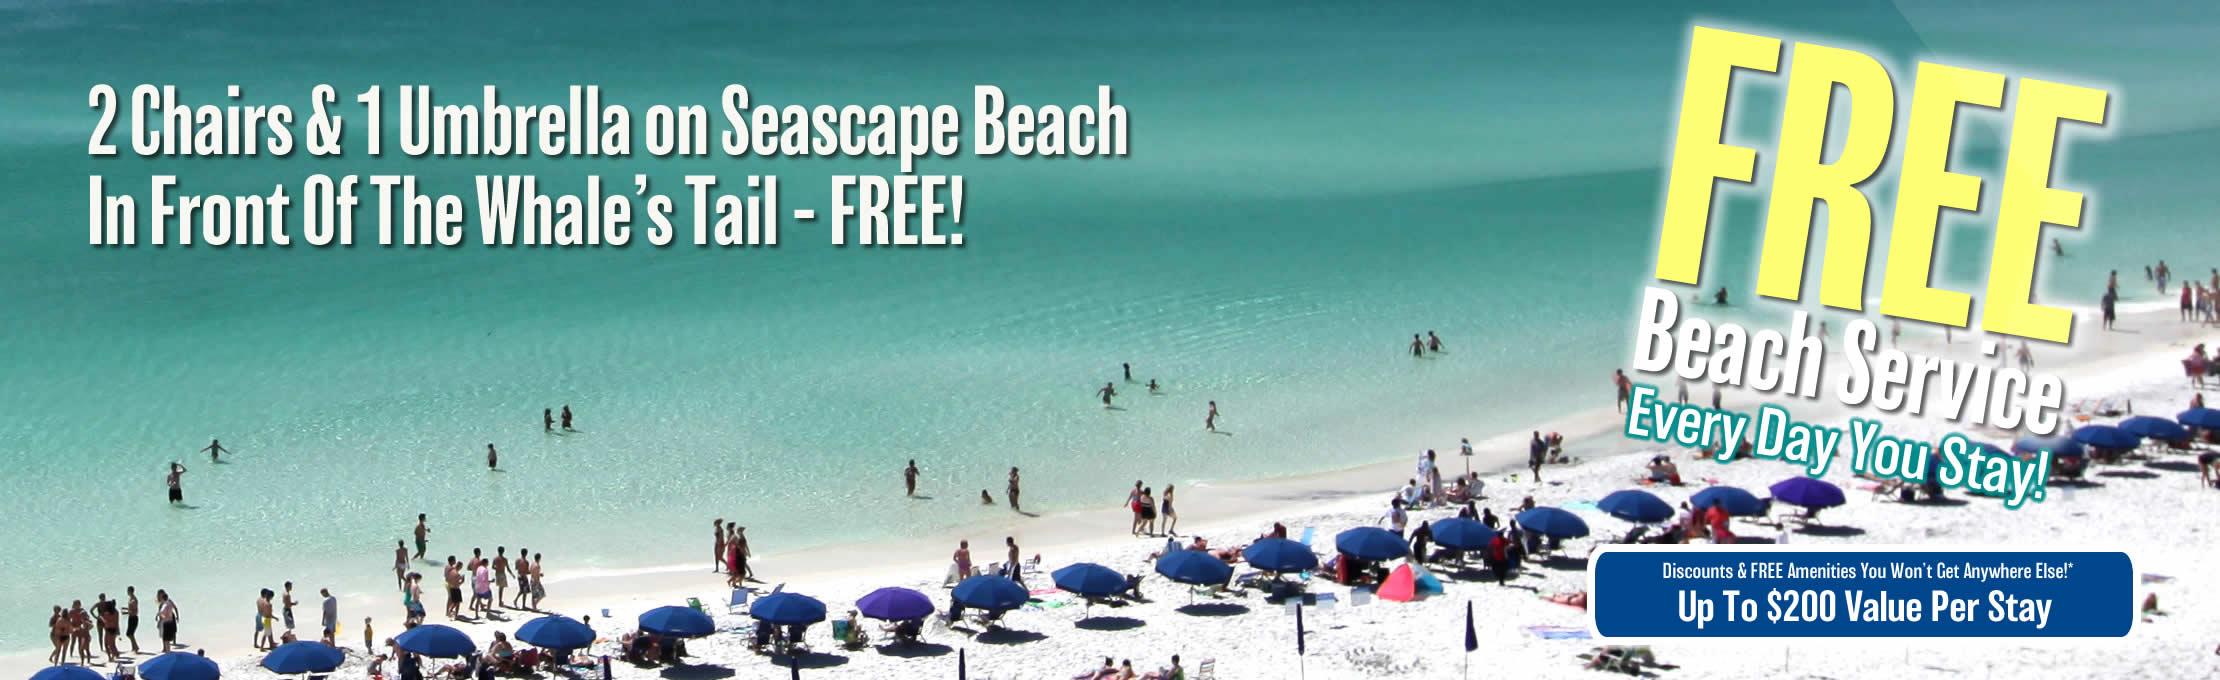 Destin Florida Condos - Seascape Resort - Seascape Resort Destin Florida Map